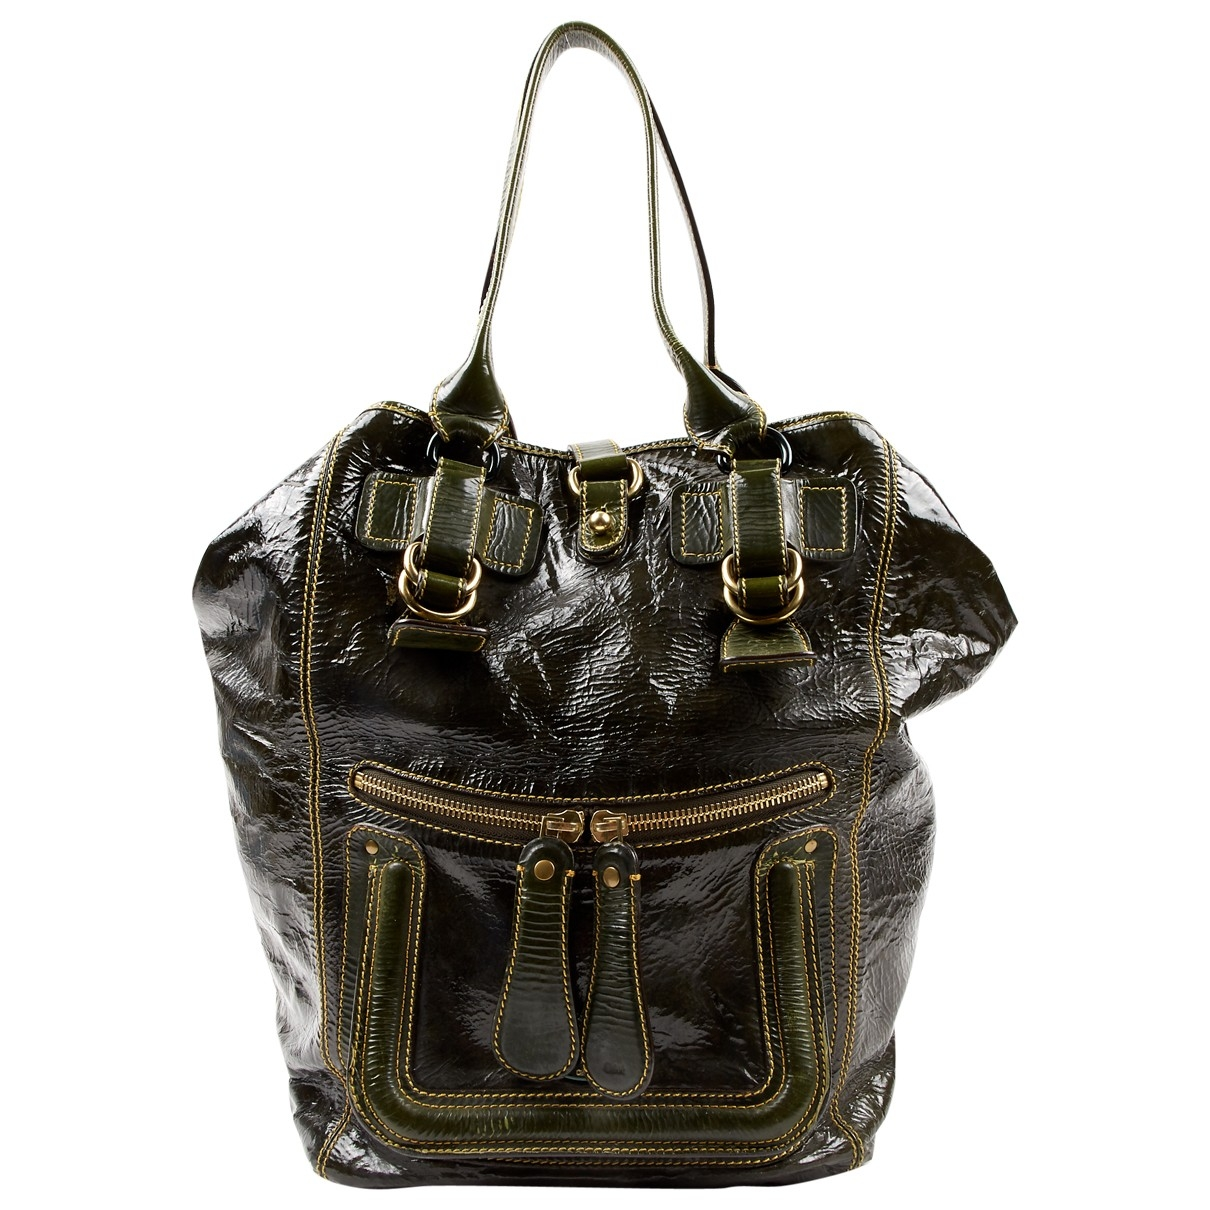 Chloé \N Khaki Patent leather handbag for Women \N